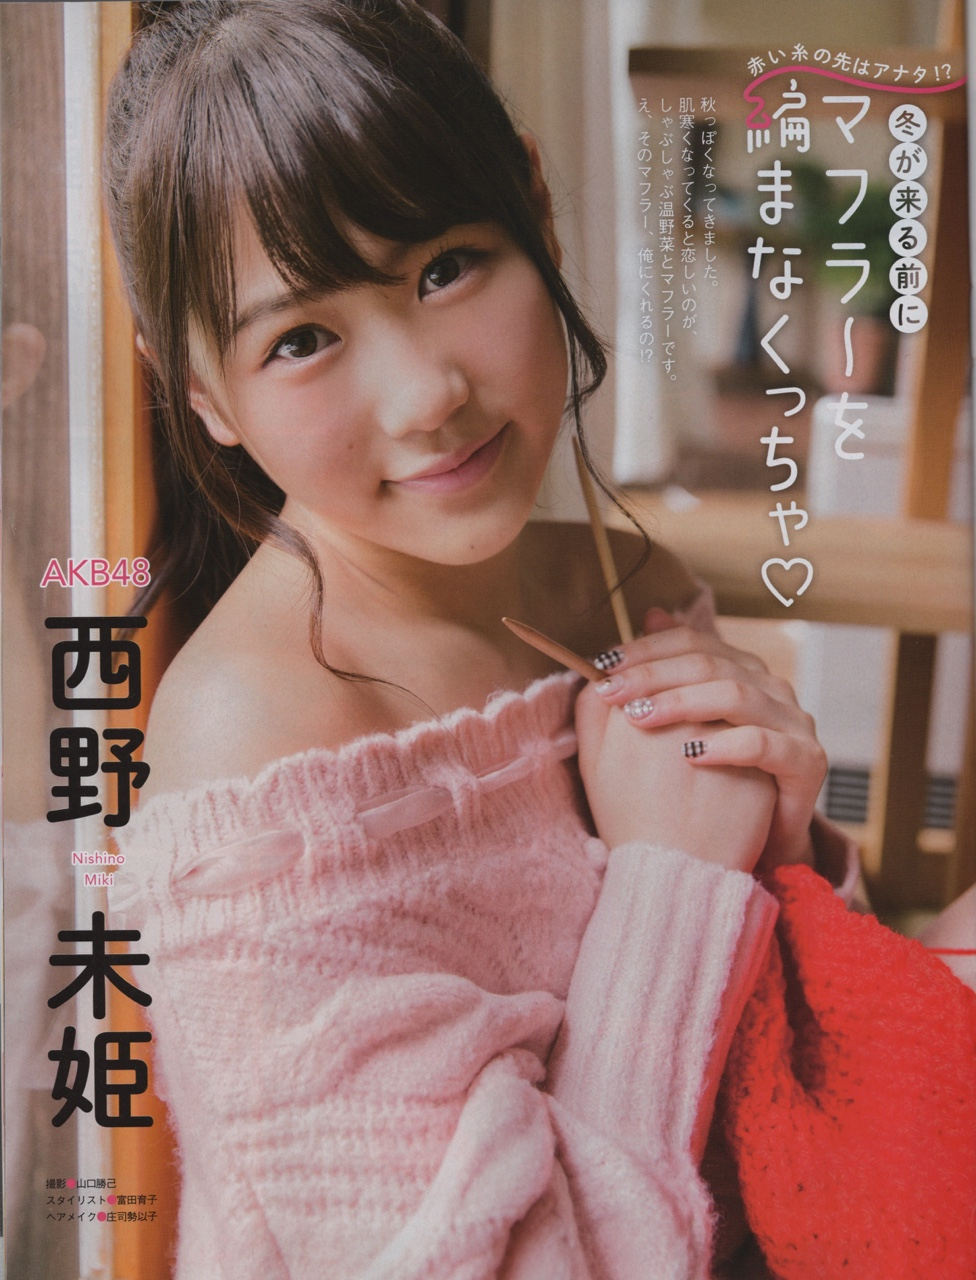 Nishino Miki 西野未姫 AKB48, EX-Taishu 2016.11 (EX大衆 2016年11月号)